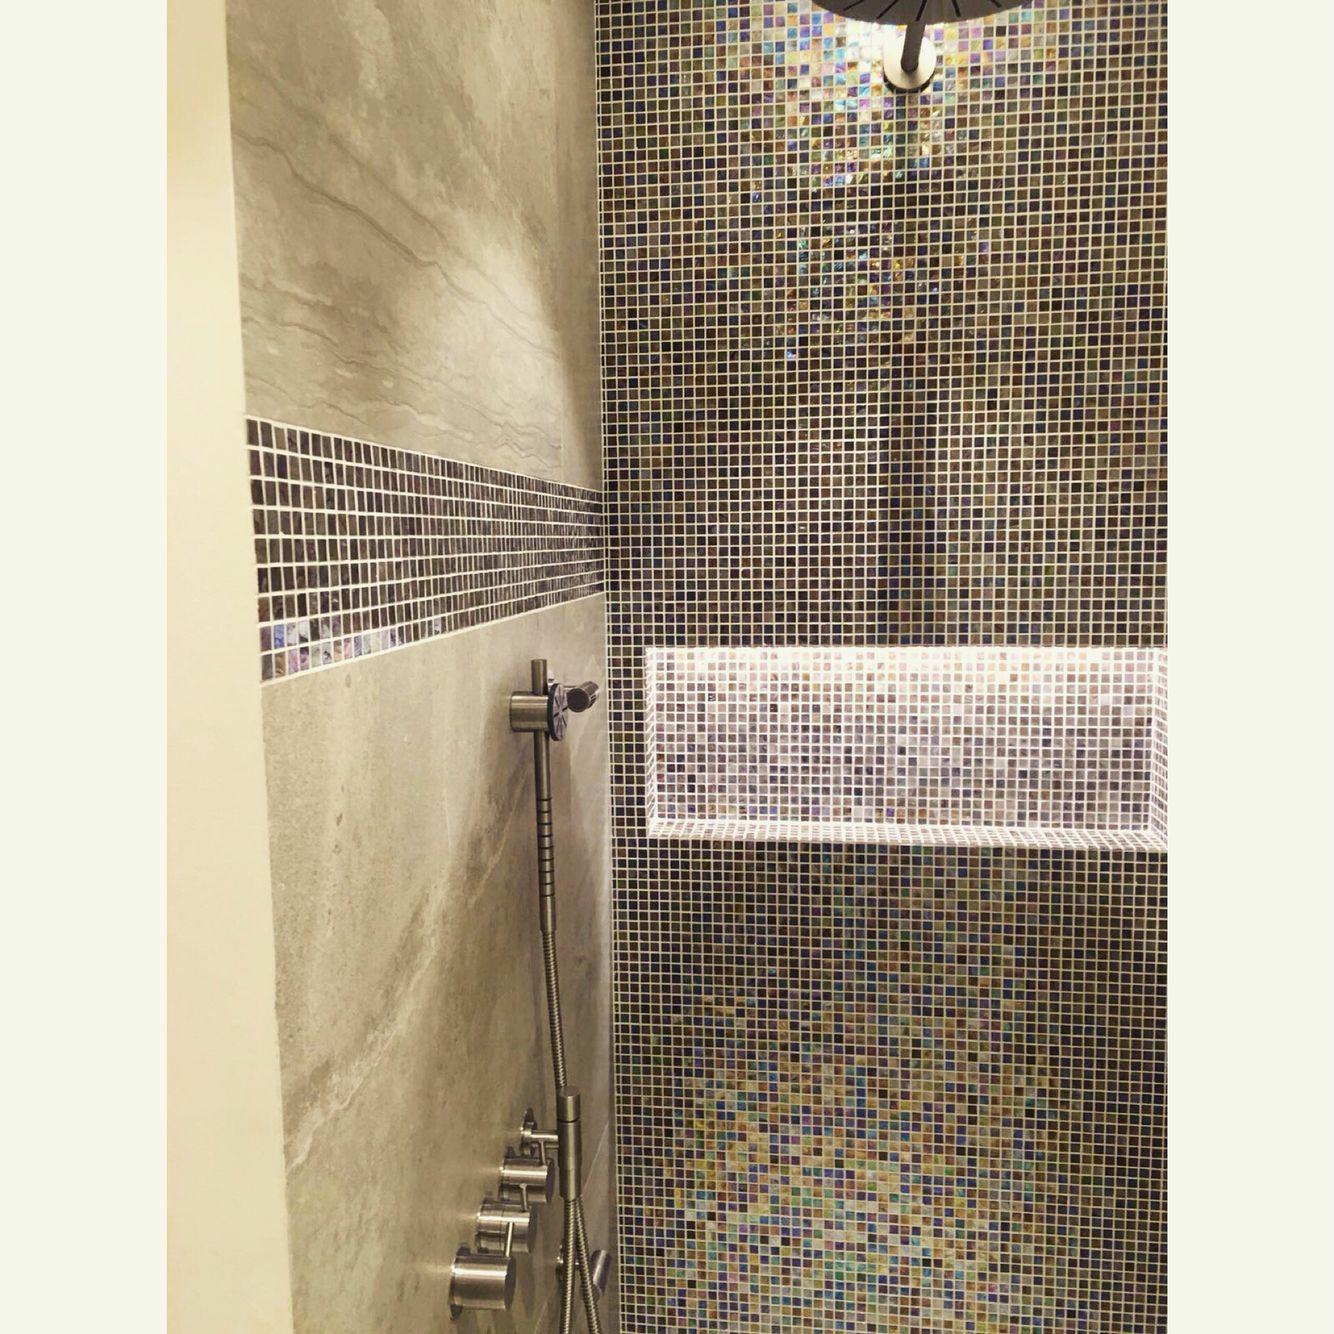 inloopdouche met mozaà ek badkamers pinterest met